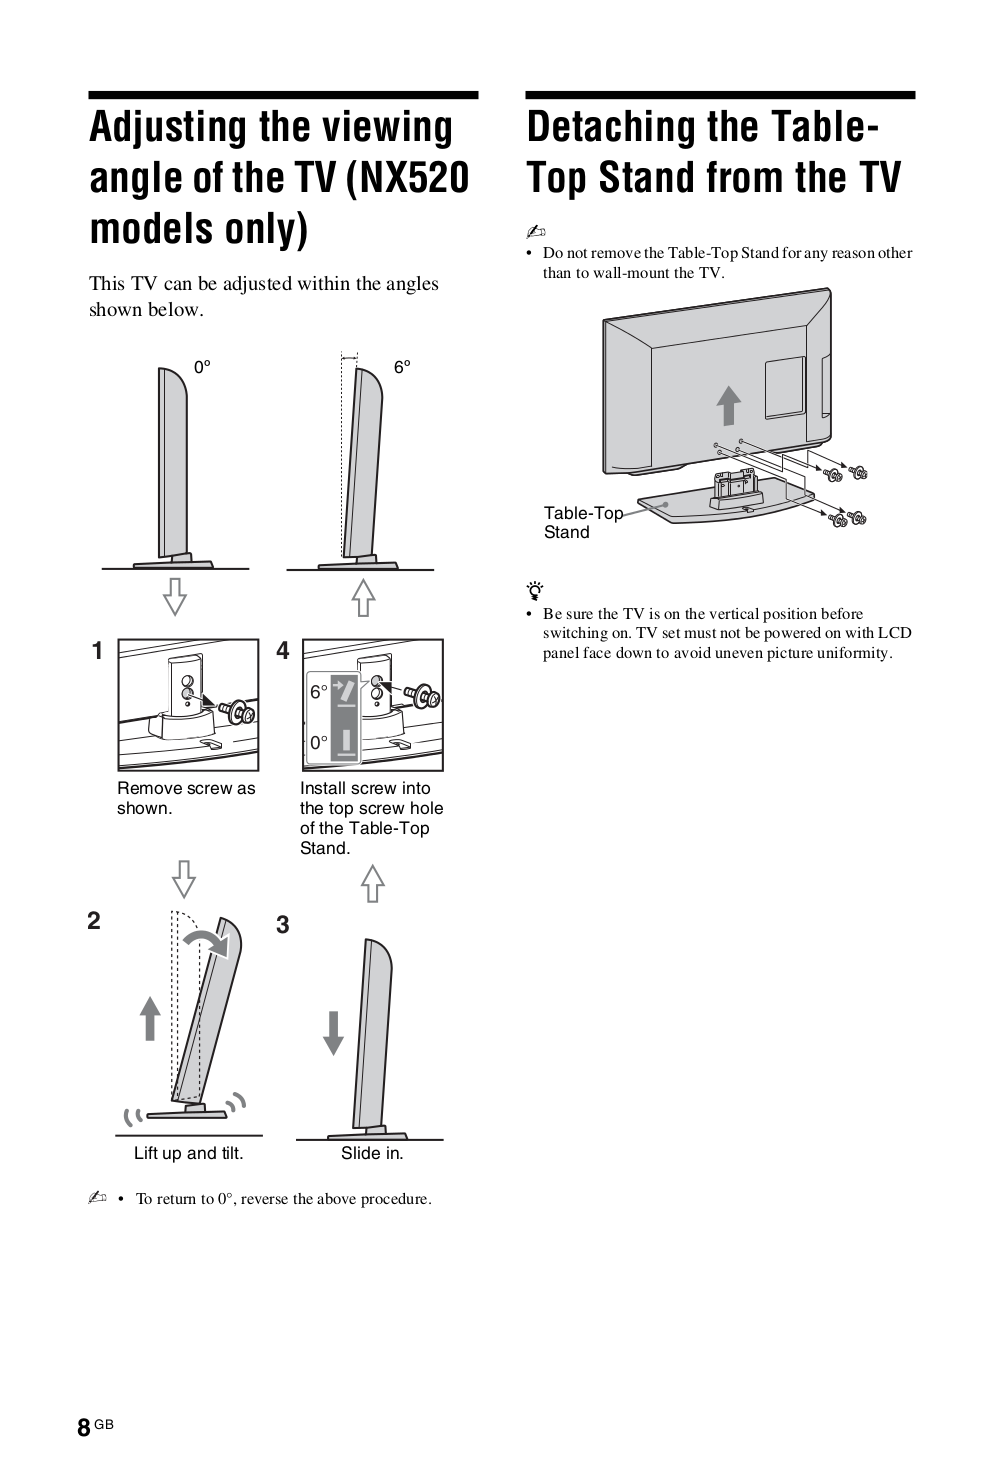 pdf manual for sony tv bravia kdl 40bx420 rh umlib com sony bravia kdl-40bx420 manual Sony BRAVIA VGA